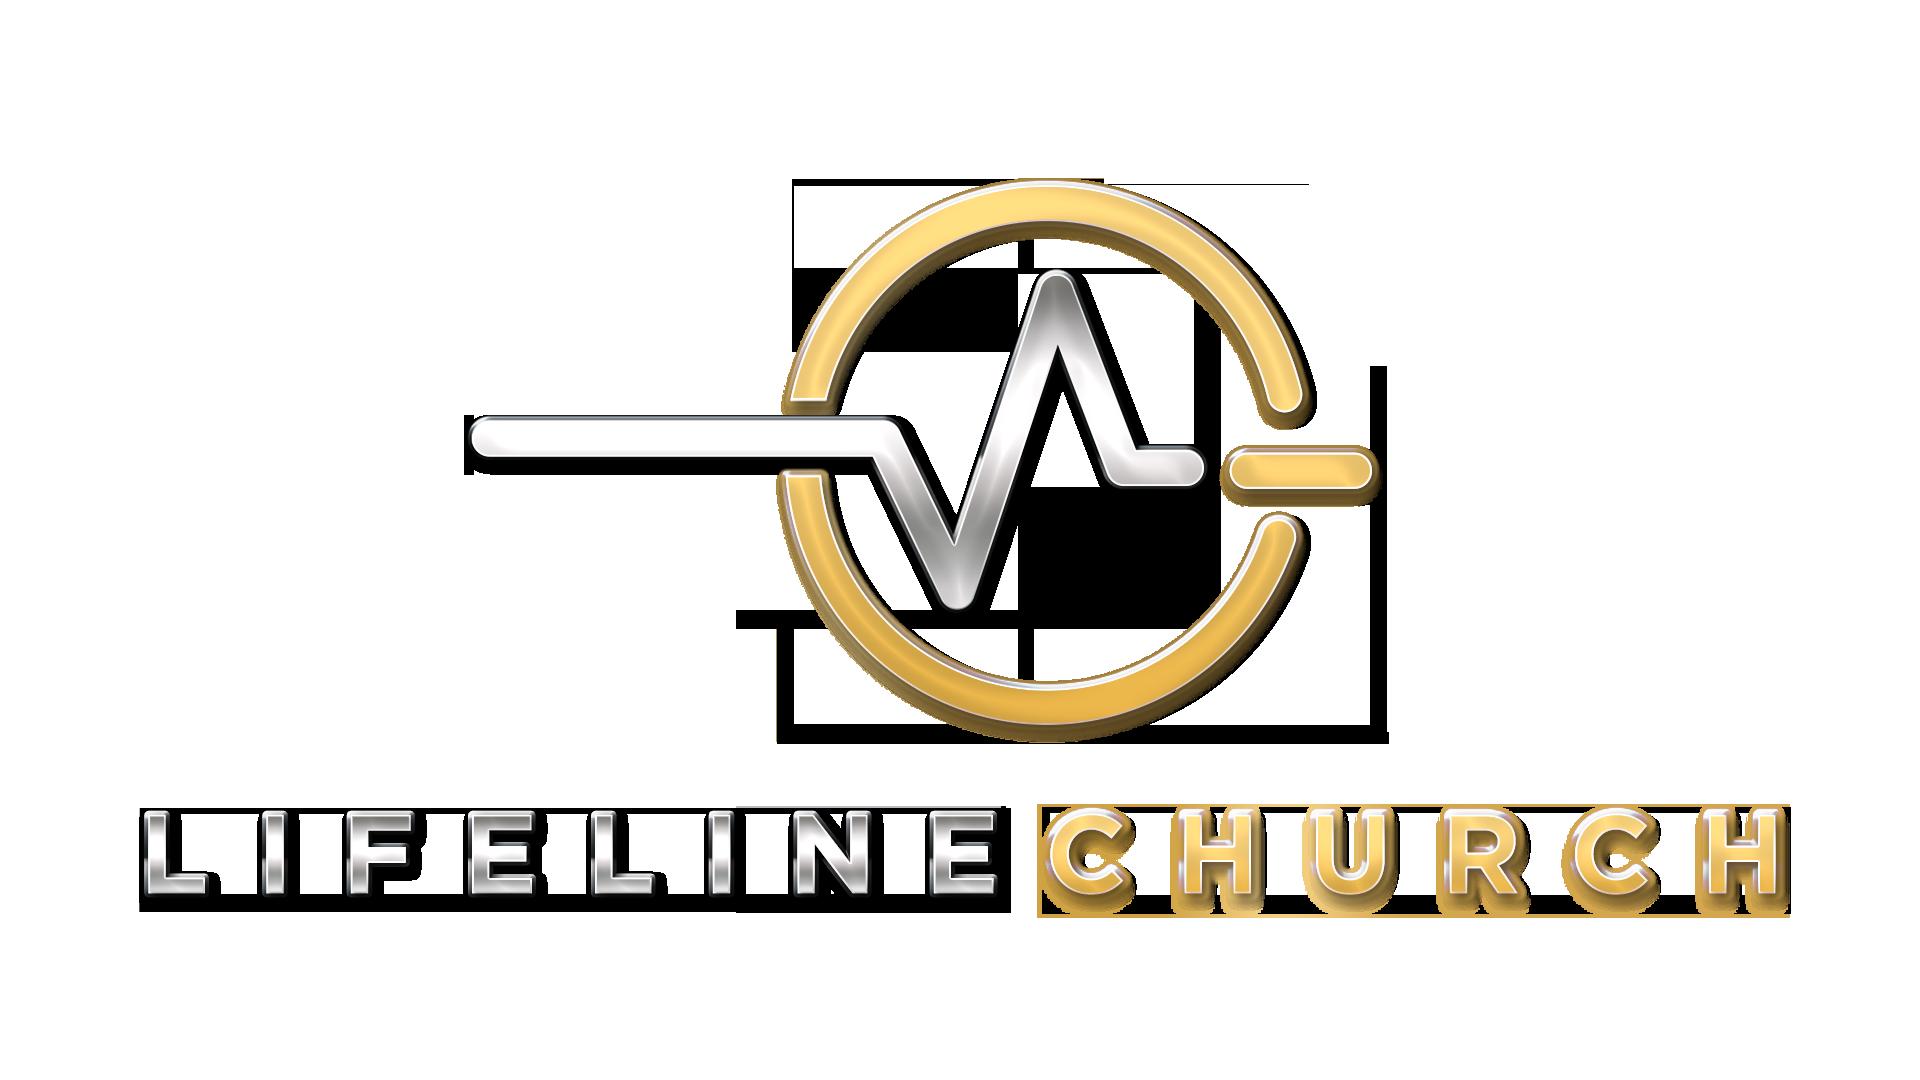 Lifeline System of Churches